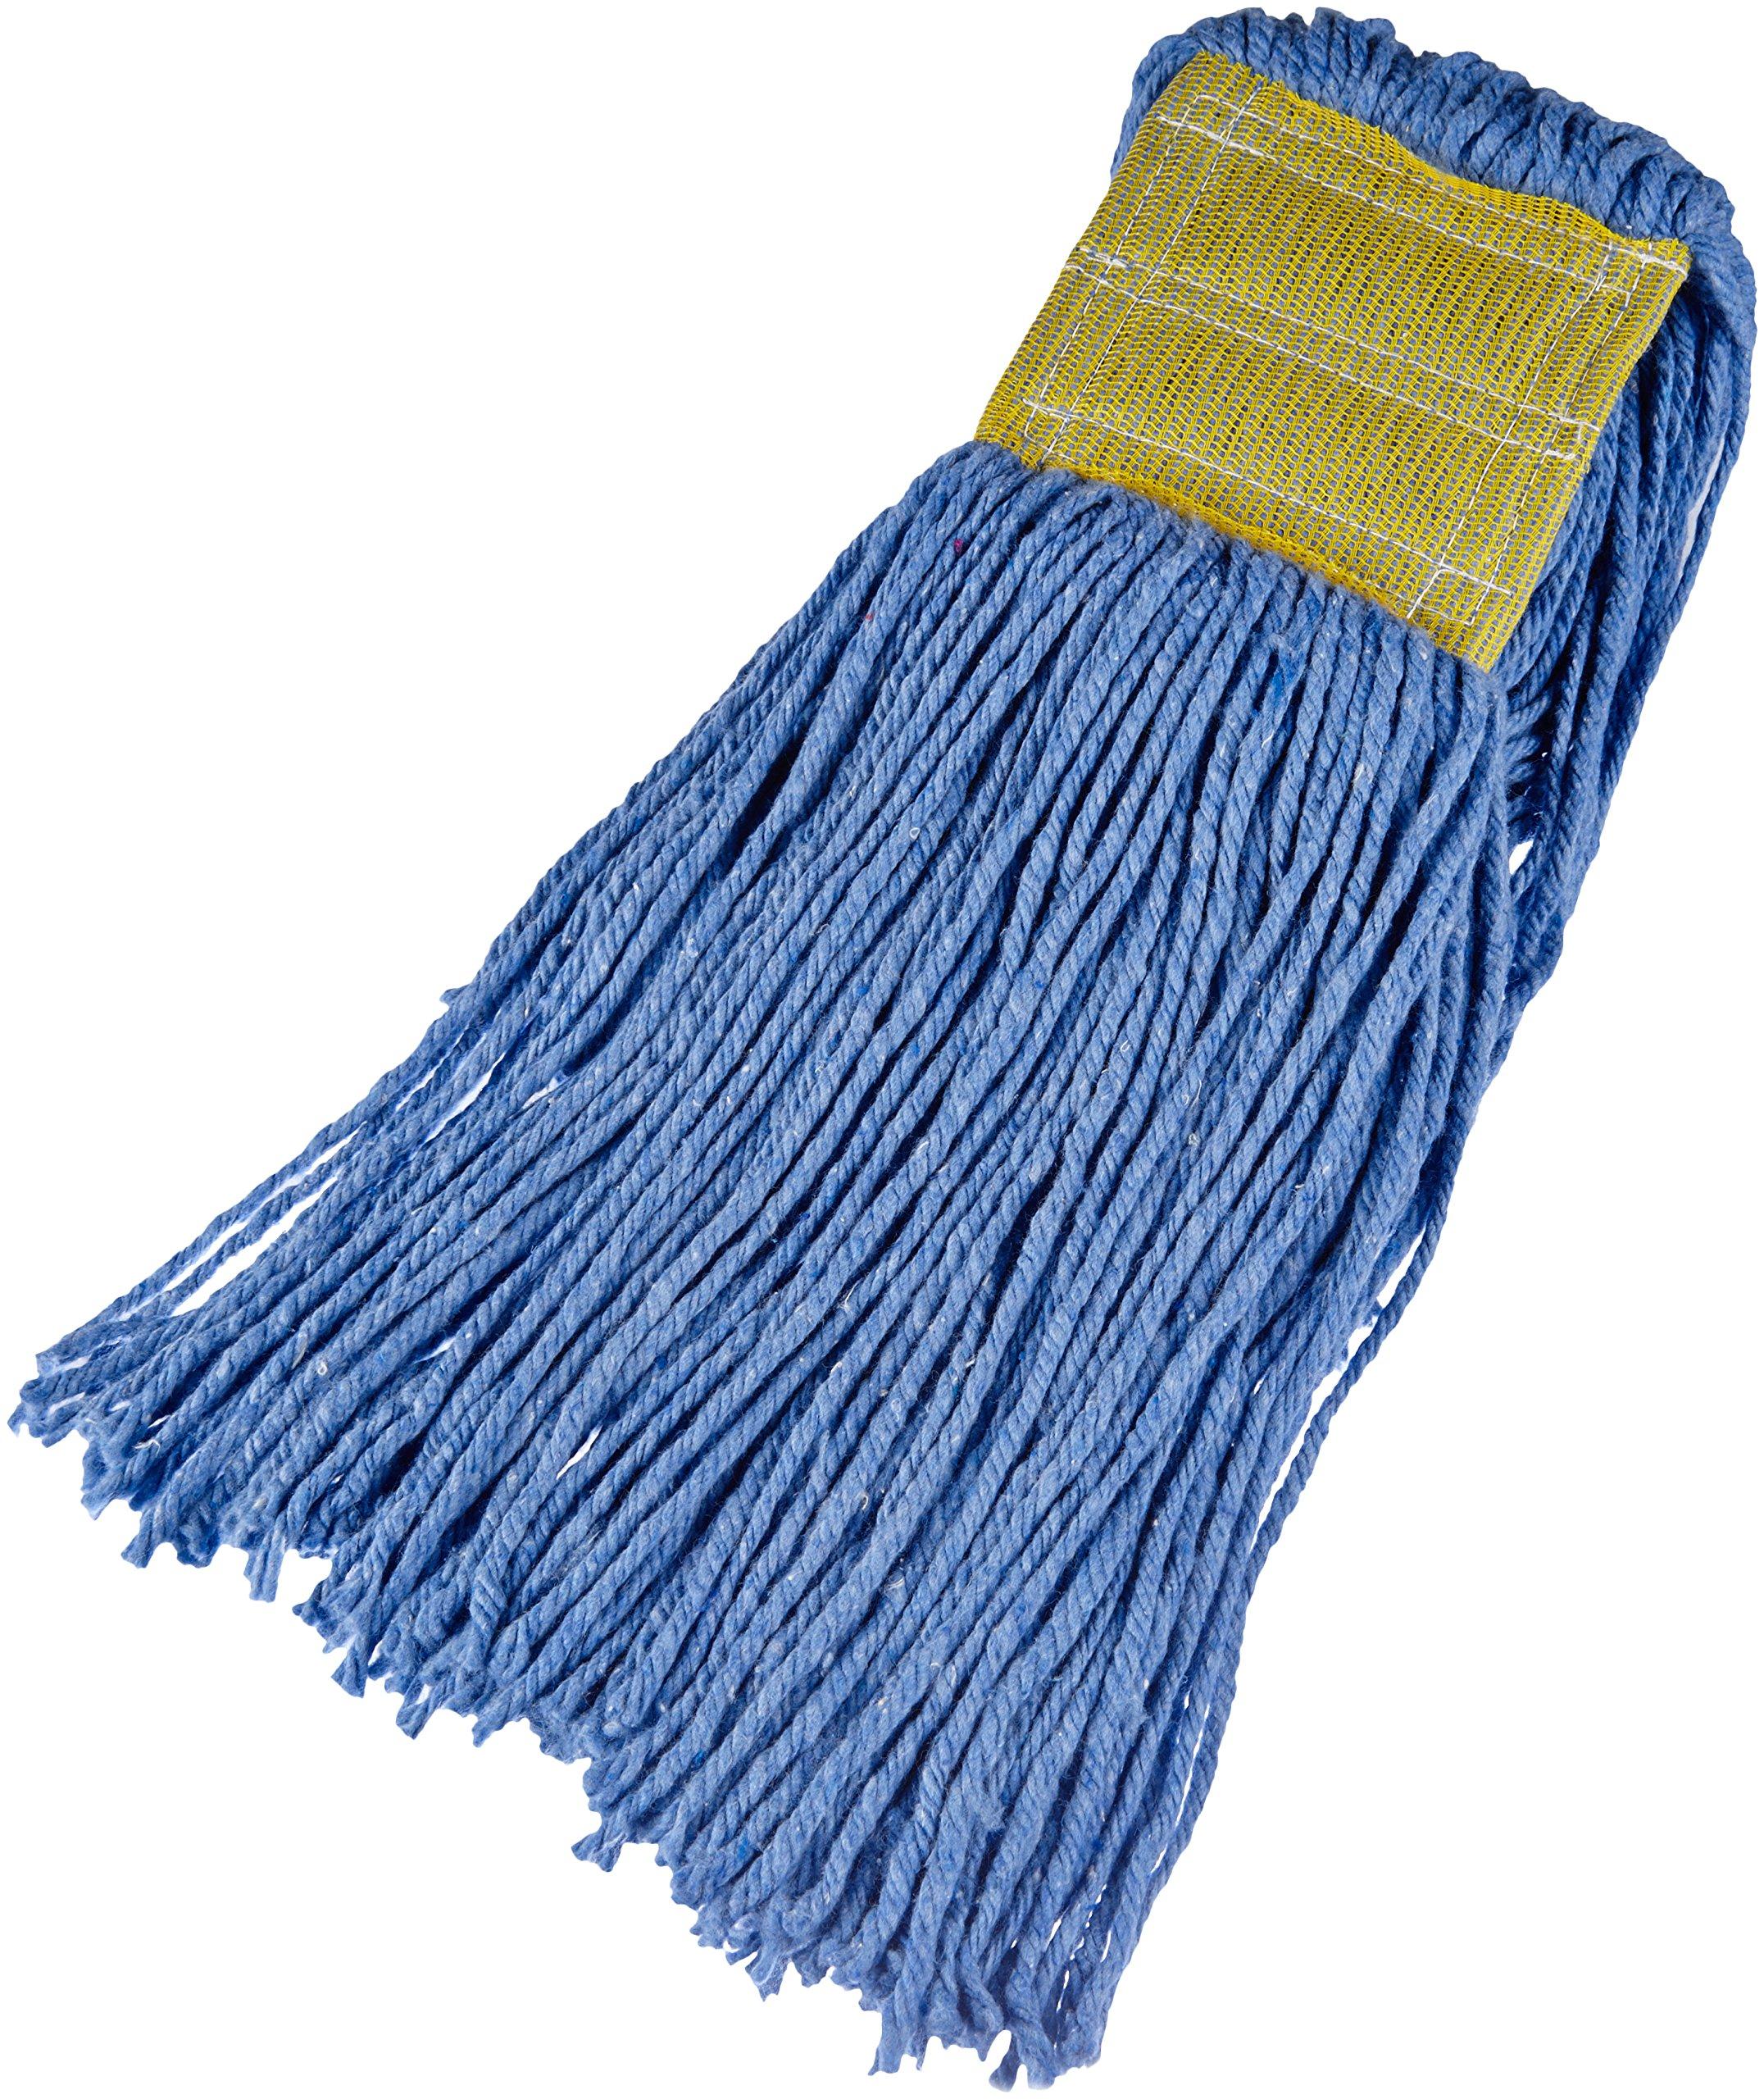 AmazonBasics Cut-End Cotton Mop Head, 5-Inch Headband, Large, Blue - 6-Pack